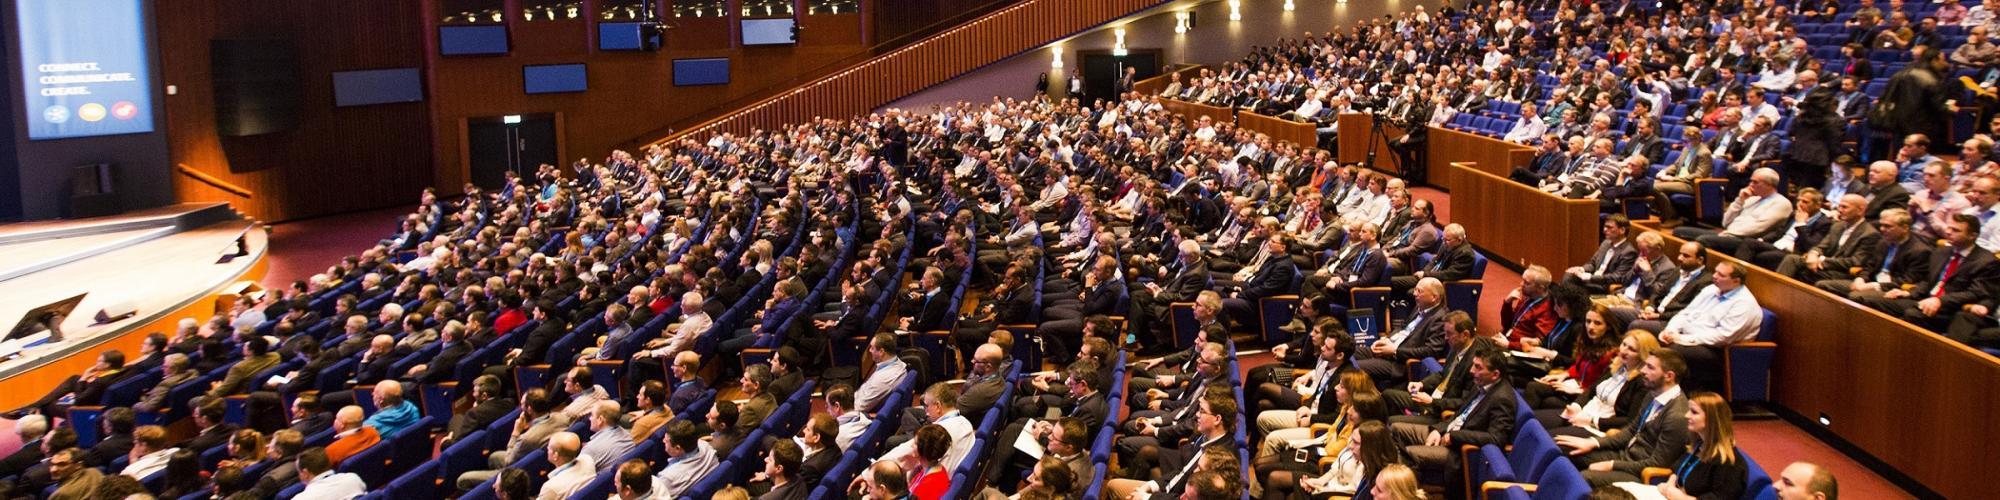 TEDxMaastricht full house